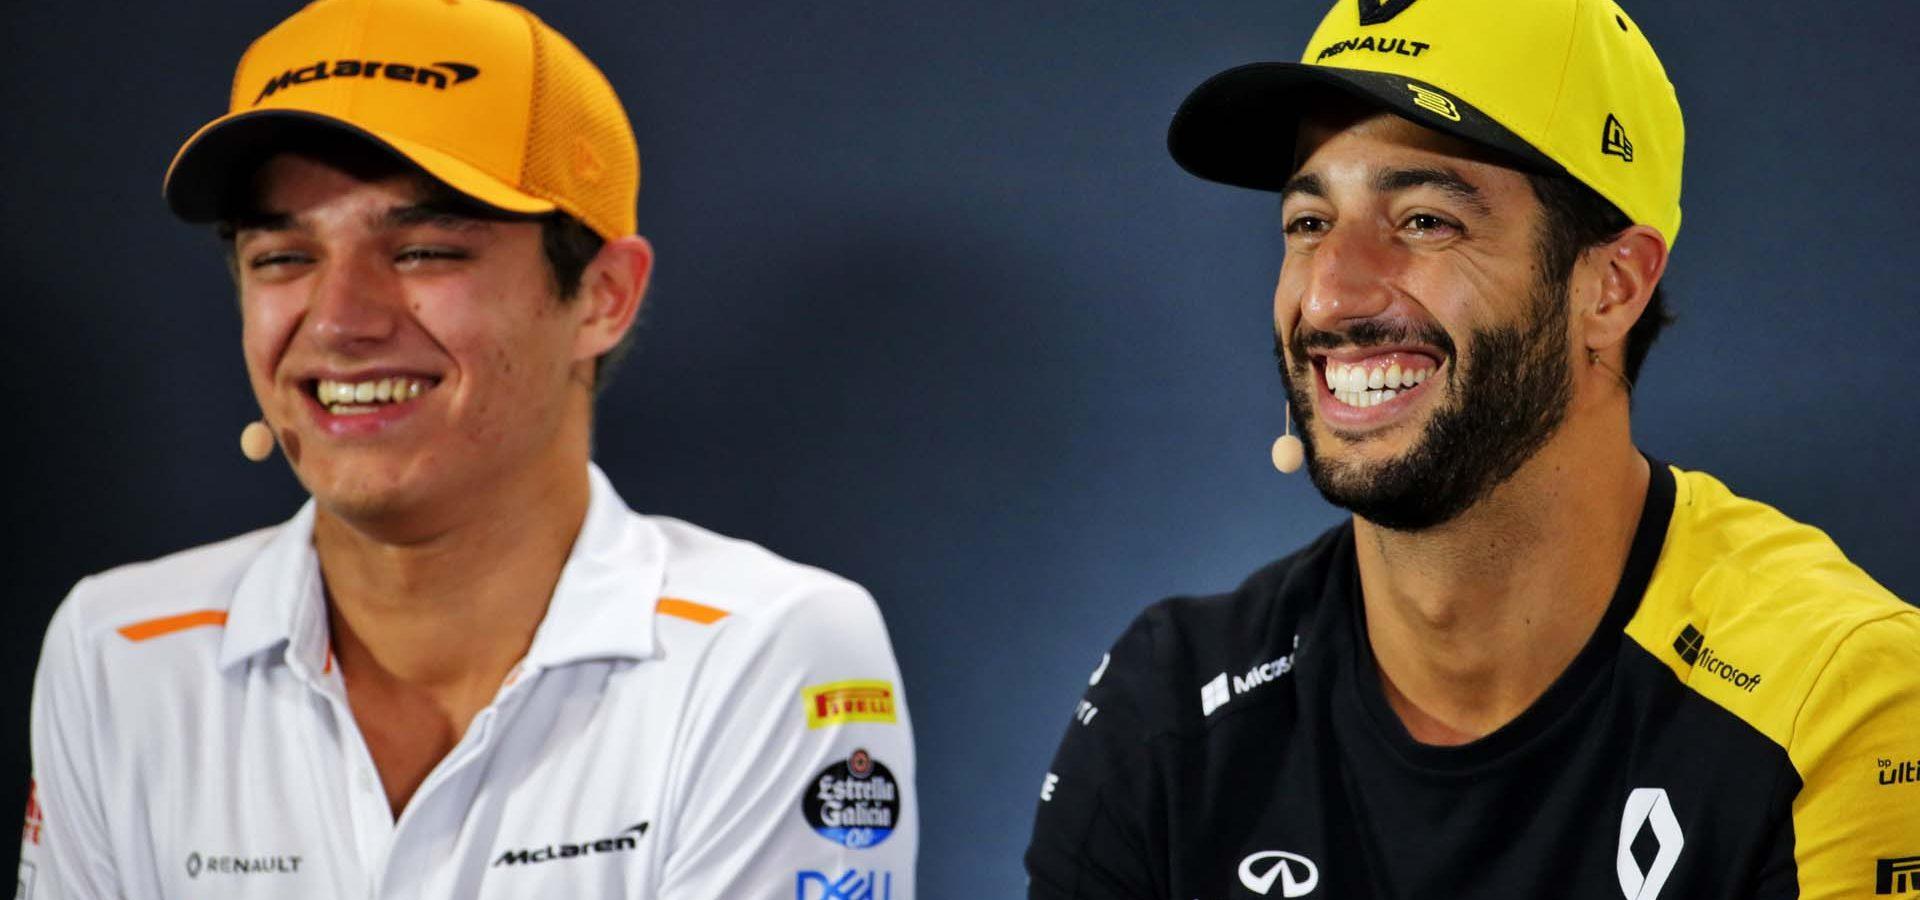 (L to R): Lando Norris (GBR) McLaren and Daniel Ricciardo (AUS) Renault F1 Team in the FIA Press Conference. Singapore Grand Prix, Thursday 19th September 2019. Marina Bay Street Circuit, Singapore.